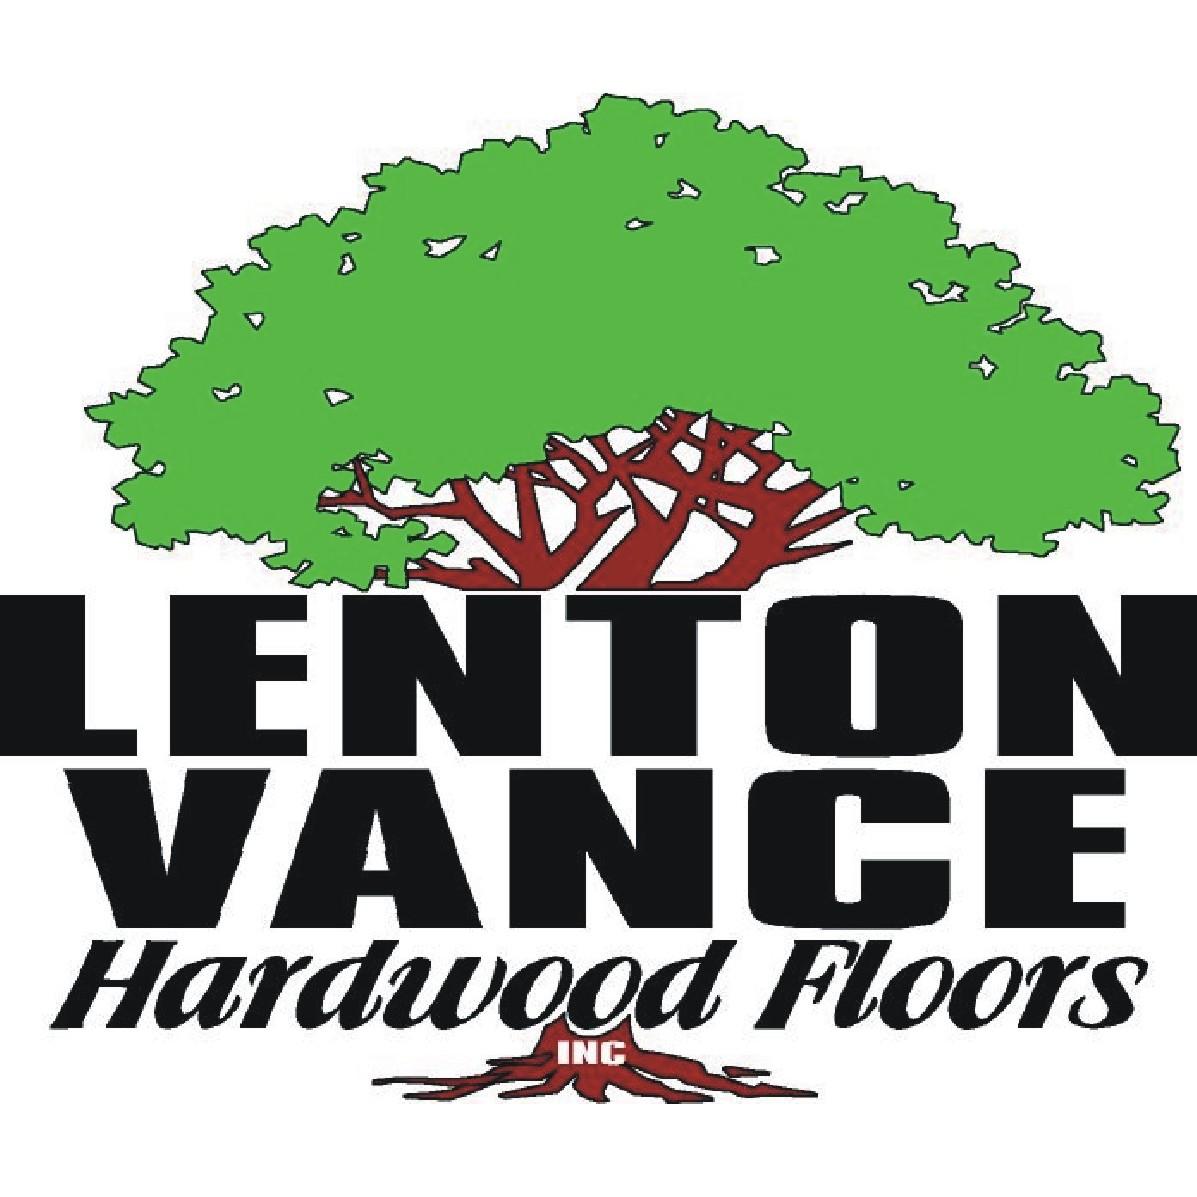 Lenton Vance Floors Inc